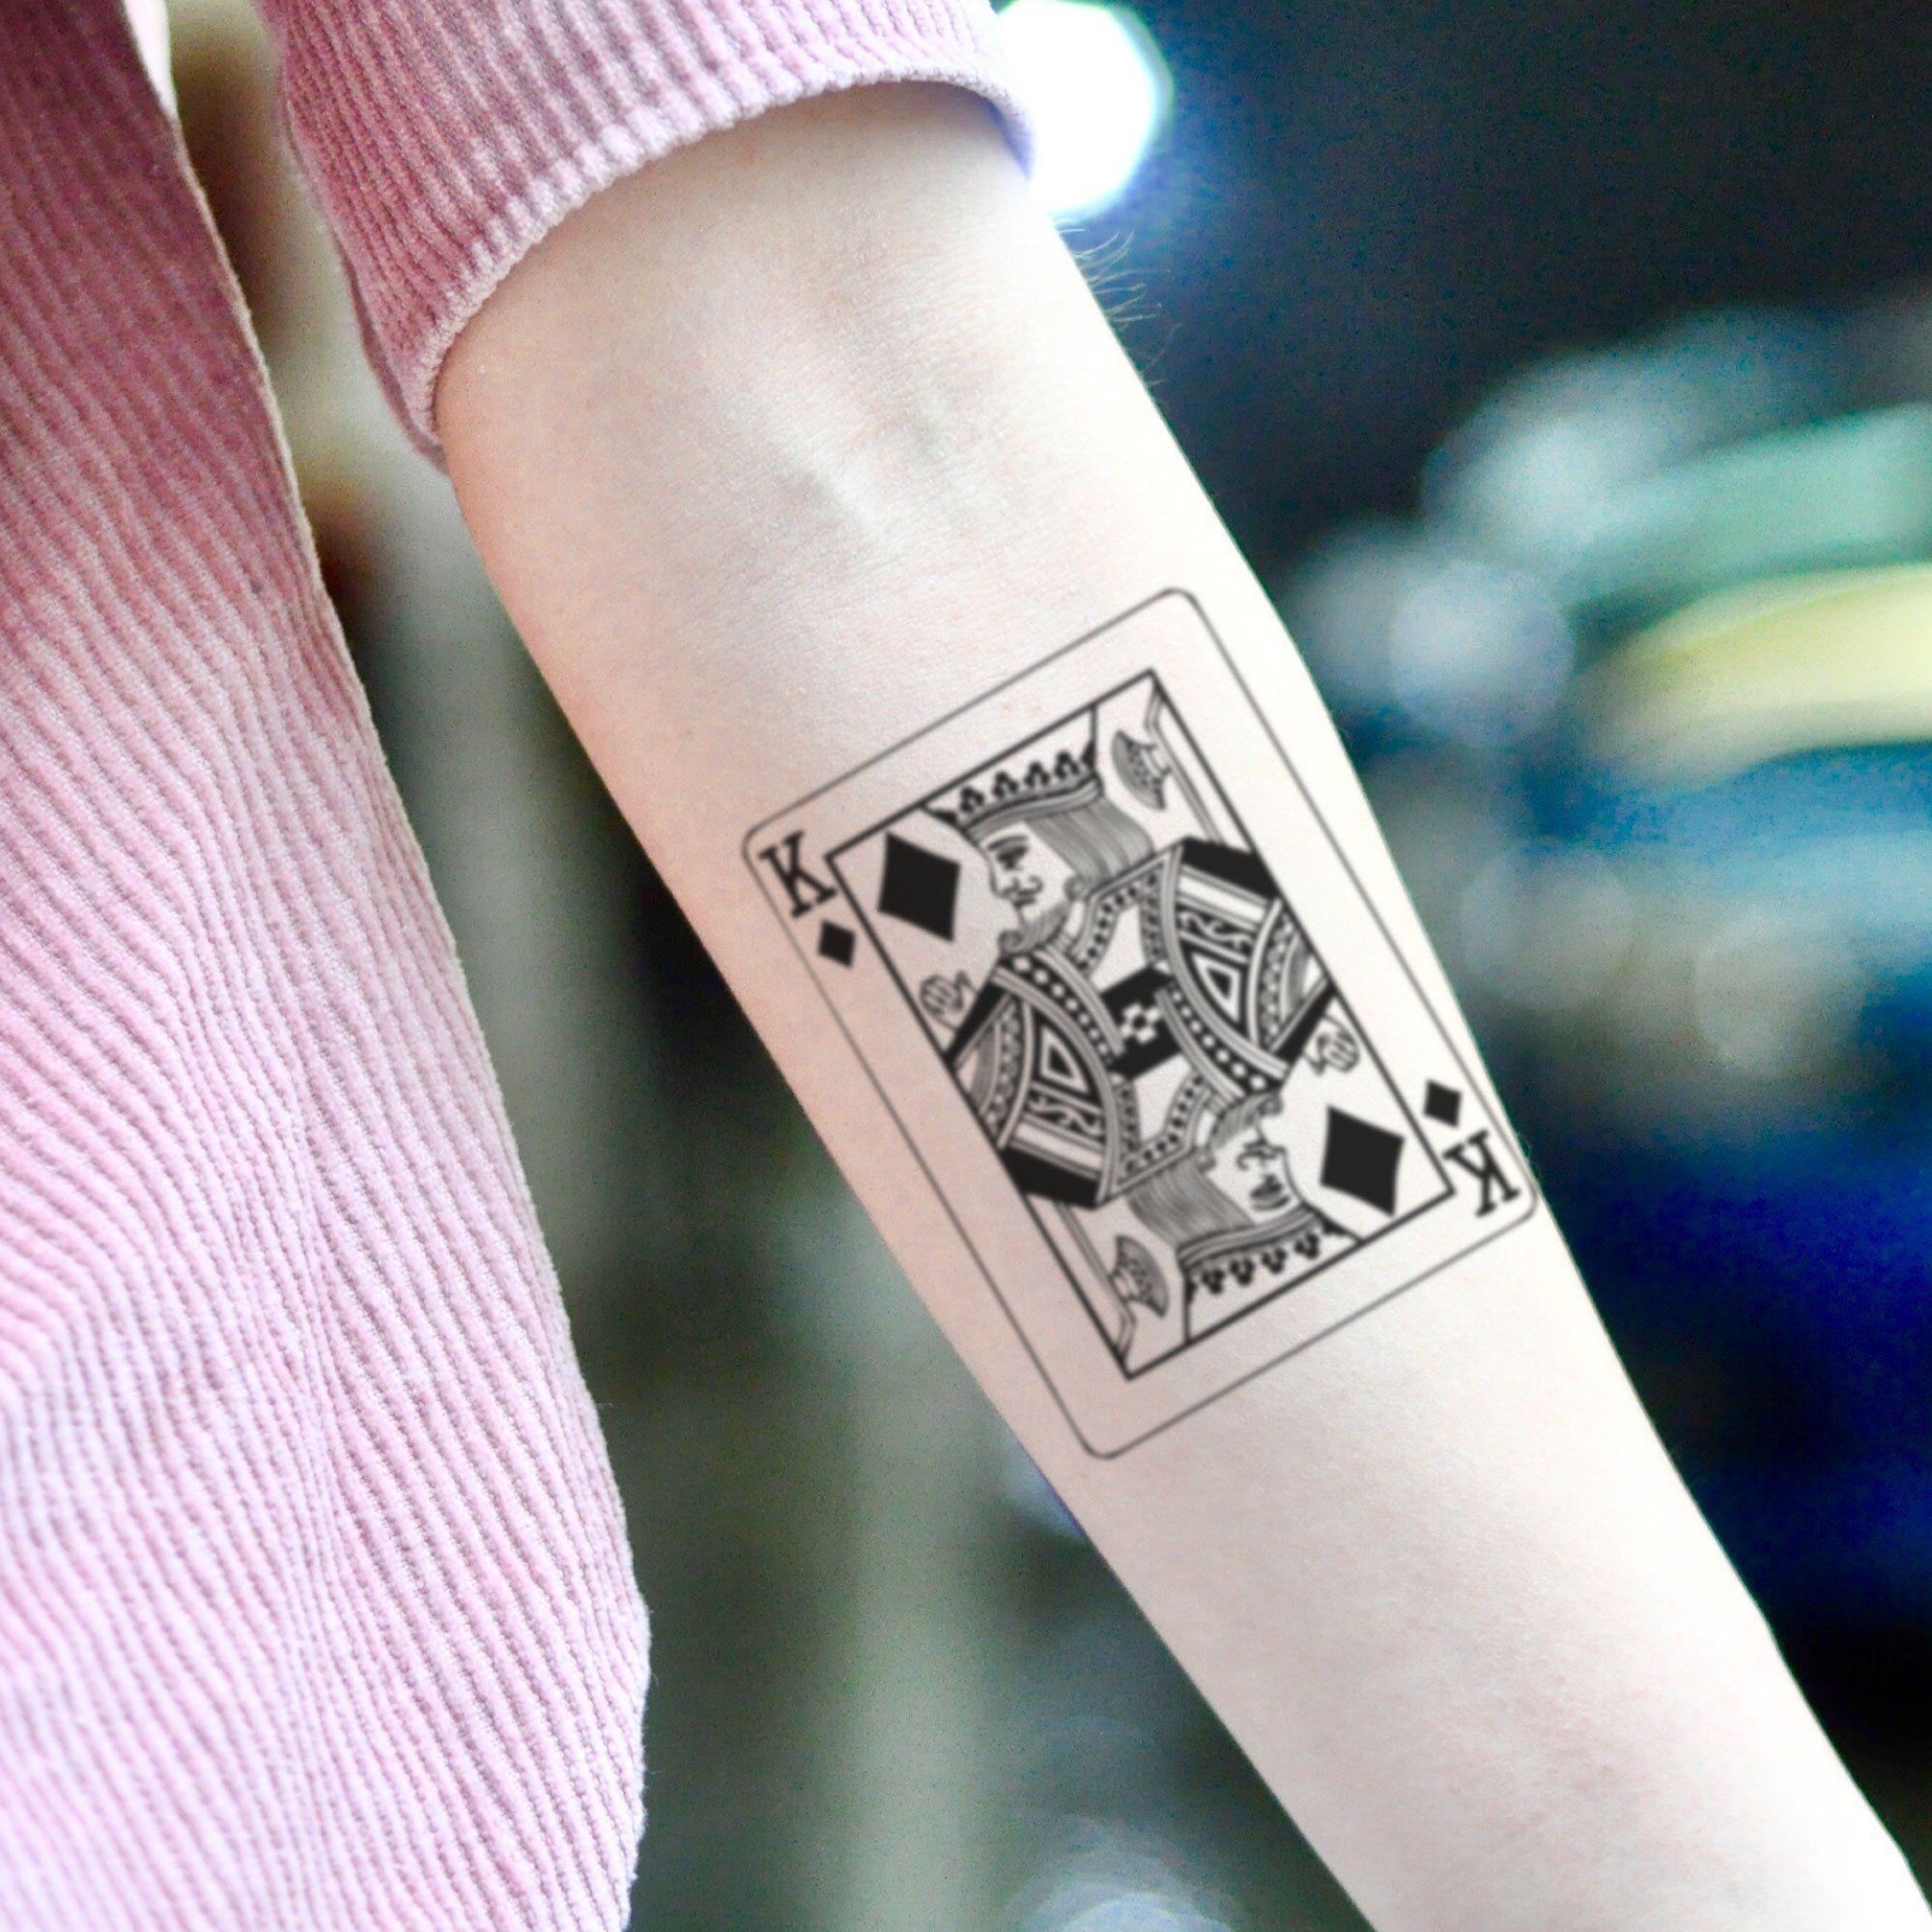 King Of Diamonds Playing Card Temporary Tattoo Sticker Set Of 2 In 2020 Card Tattoo Designs Card Tattoo Tattoo Stickers